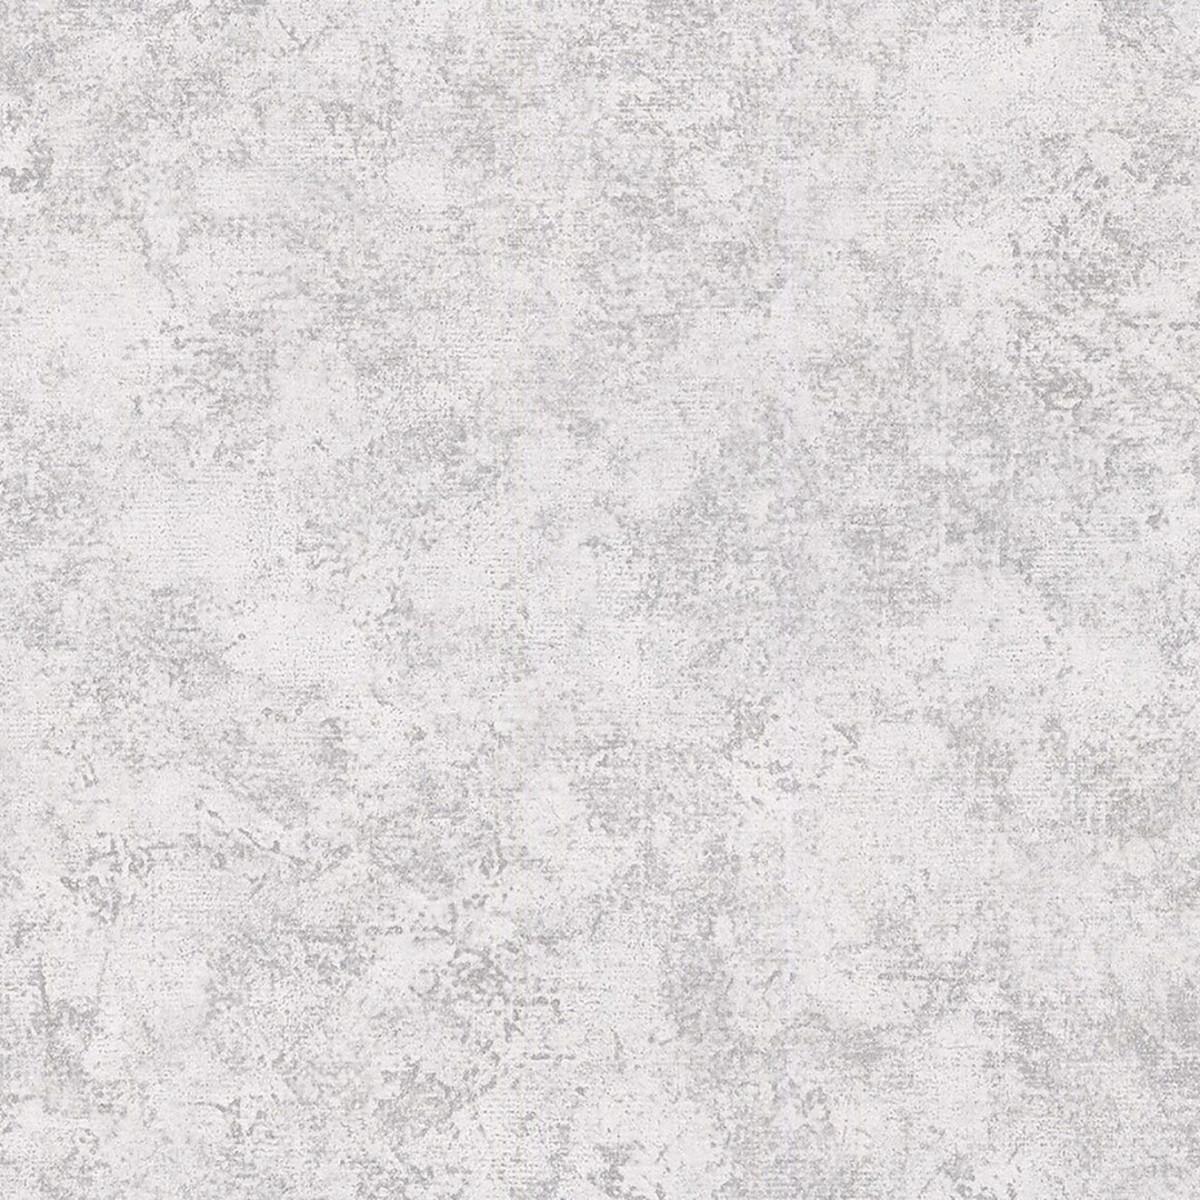 Обои флизелиновые Мир Авангард Beyond белые 1.06 м 902